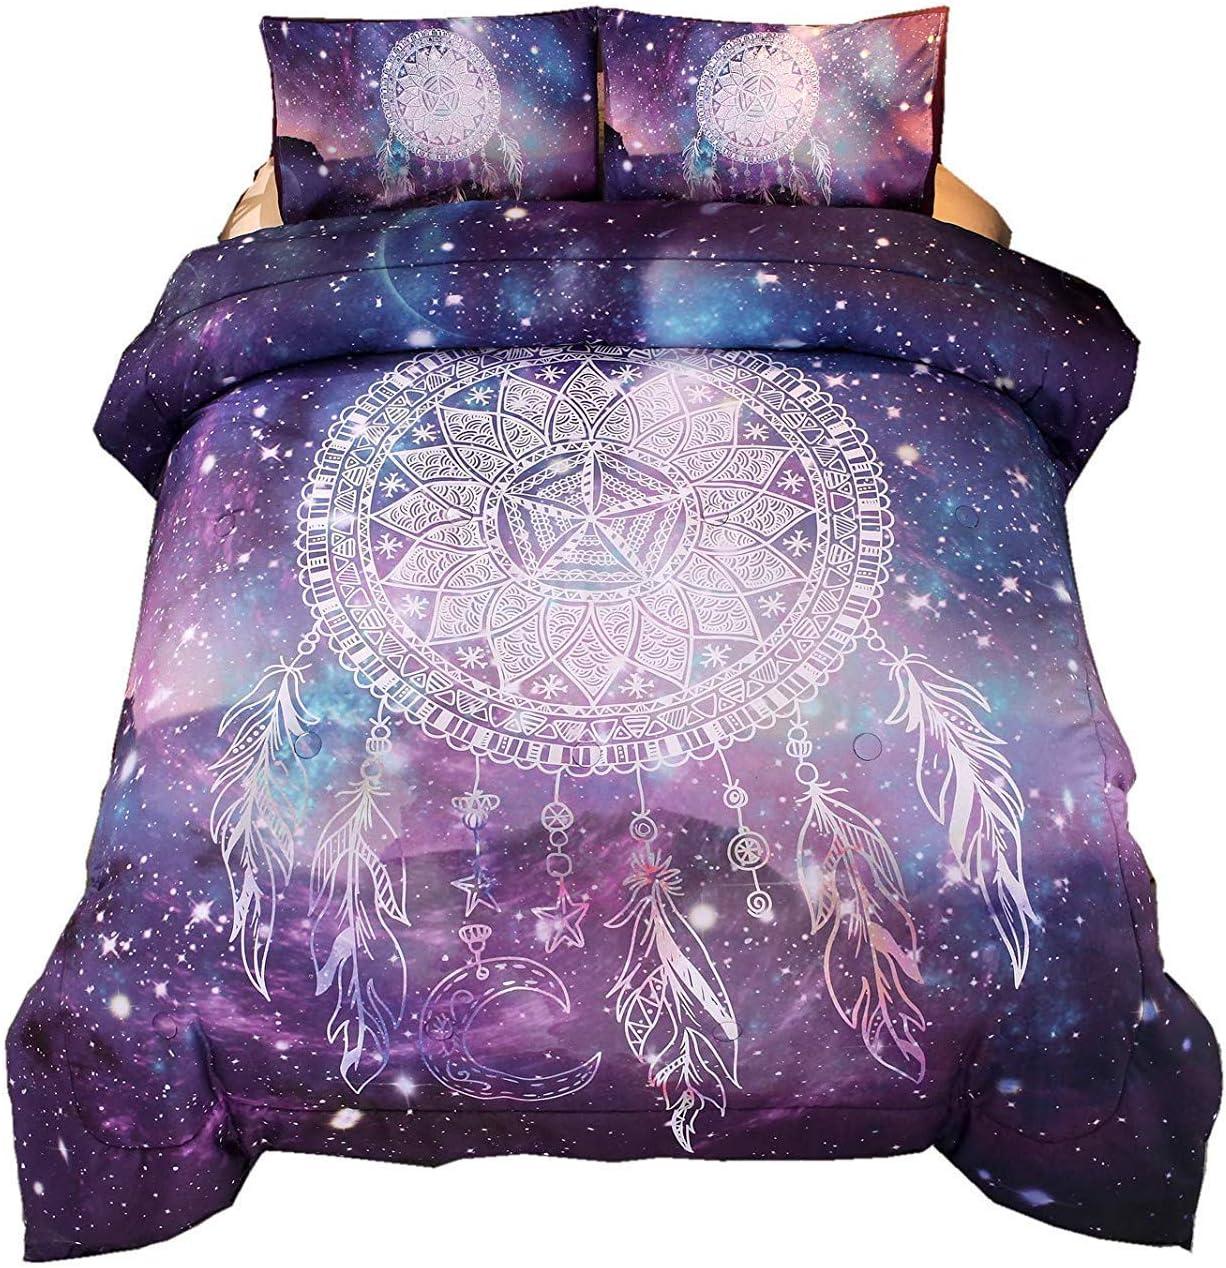 Holawakaka Bohemian Galaxy Tucson Mall Dream Catcher Oakland Mall Comforter Kids Teen Set